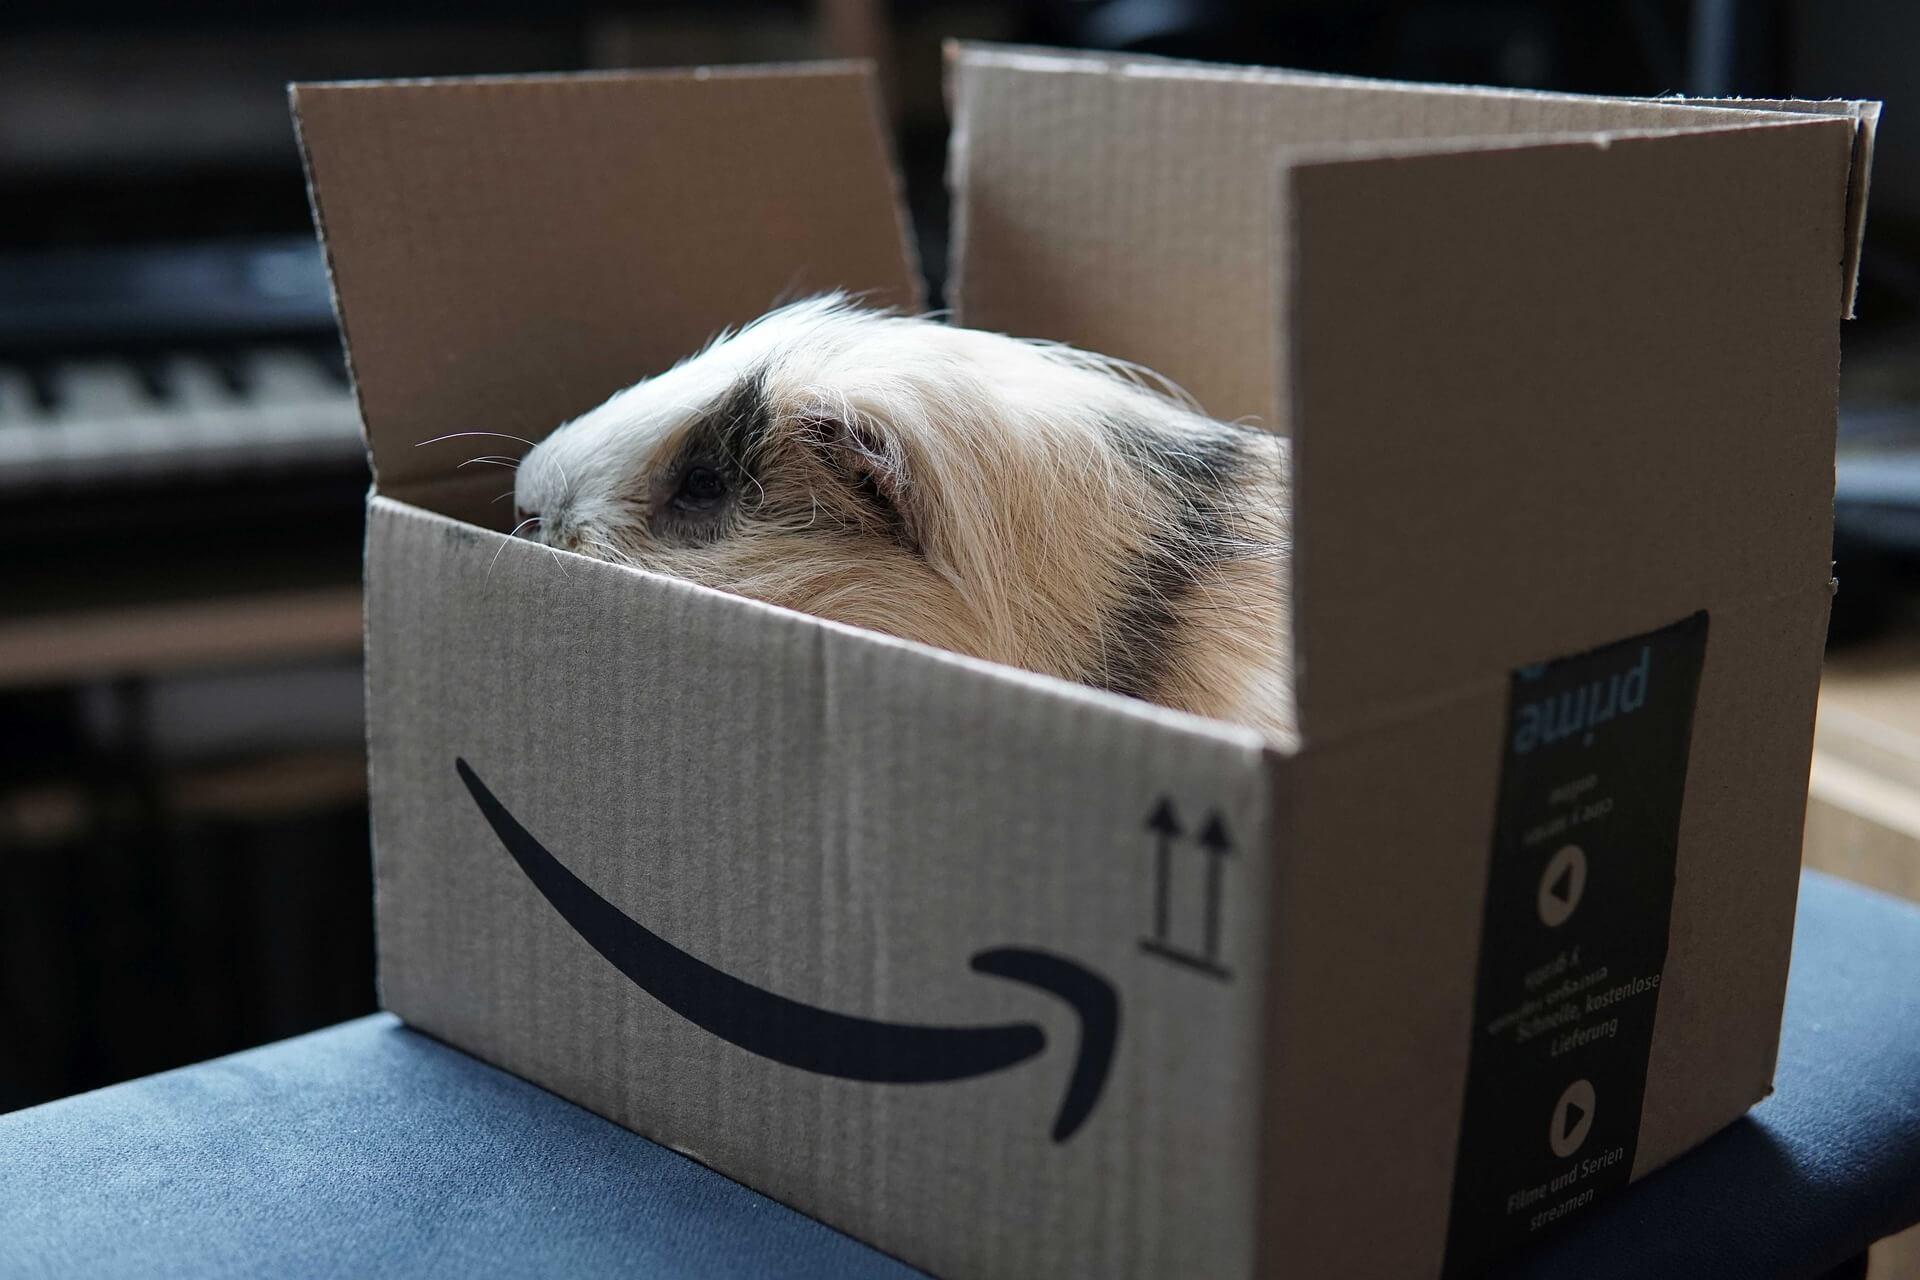 Amazon Prime, Live TV